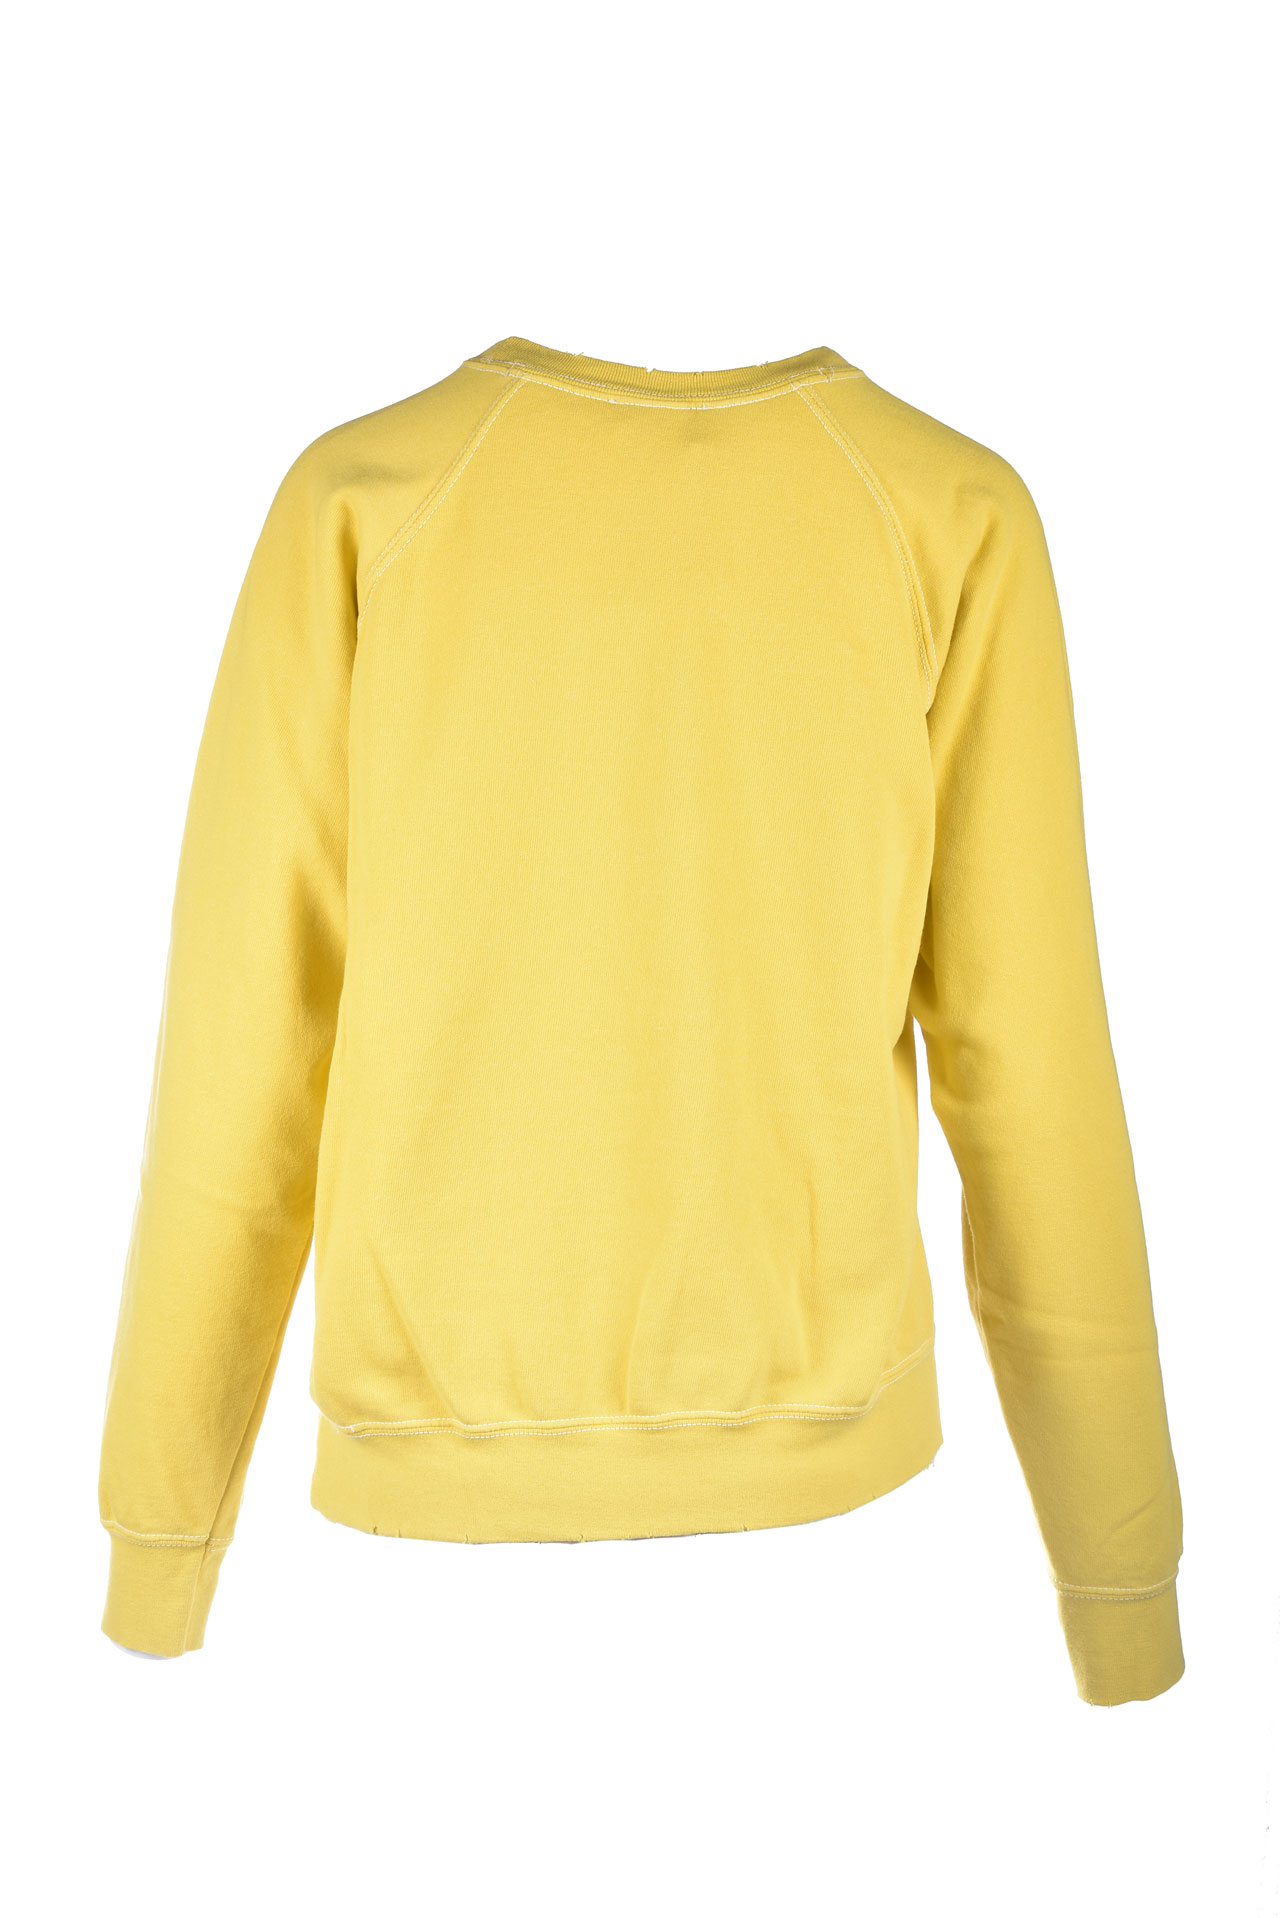 Yellow crewneck sweatshirt with white printed logo SEMICOUTURE |  | Y1SJ21B28